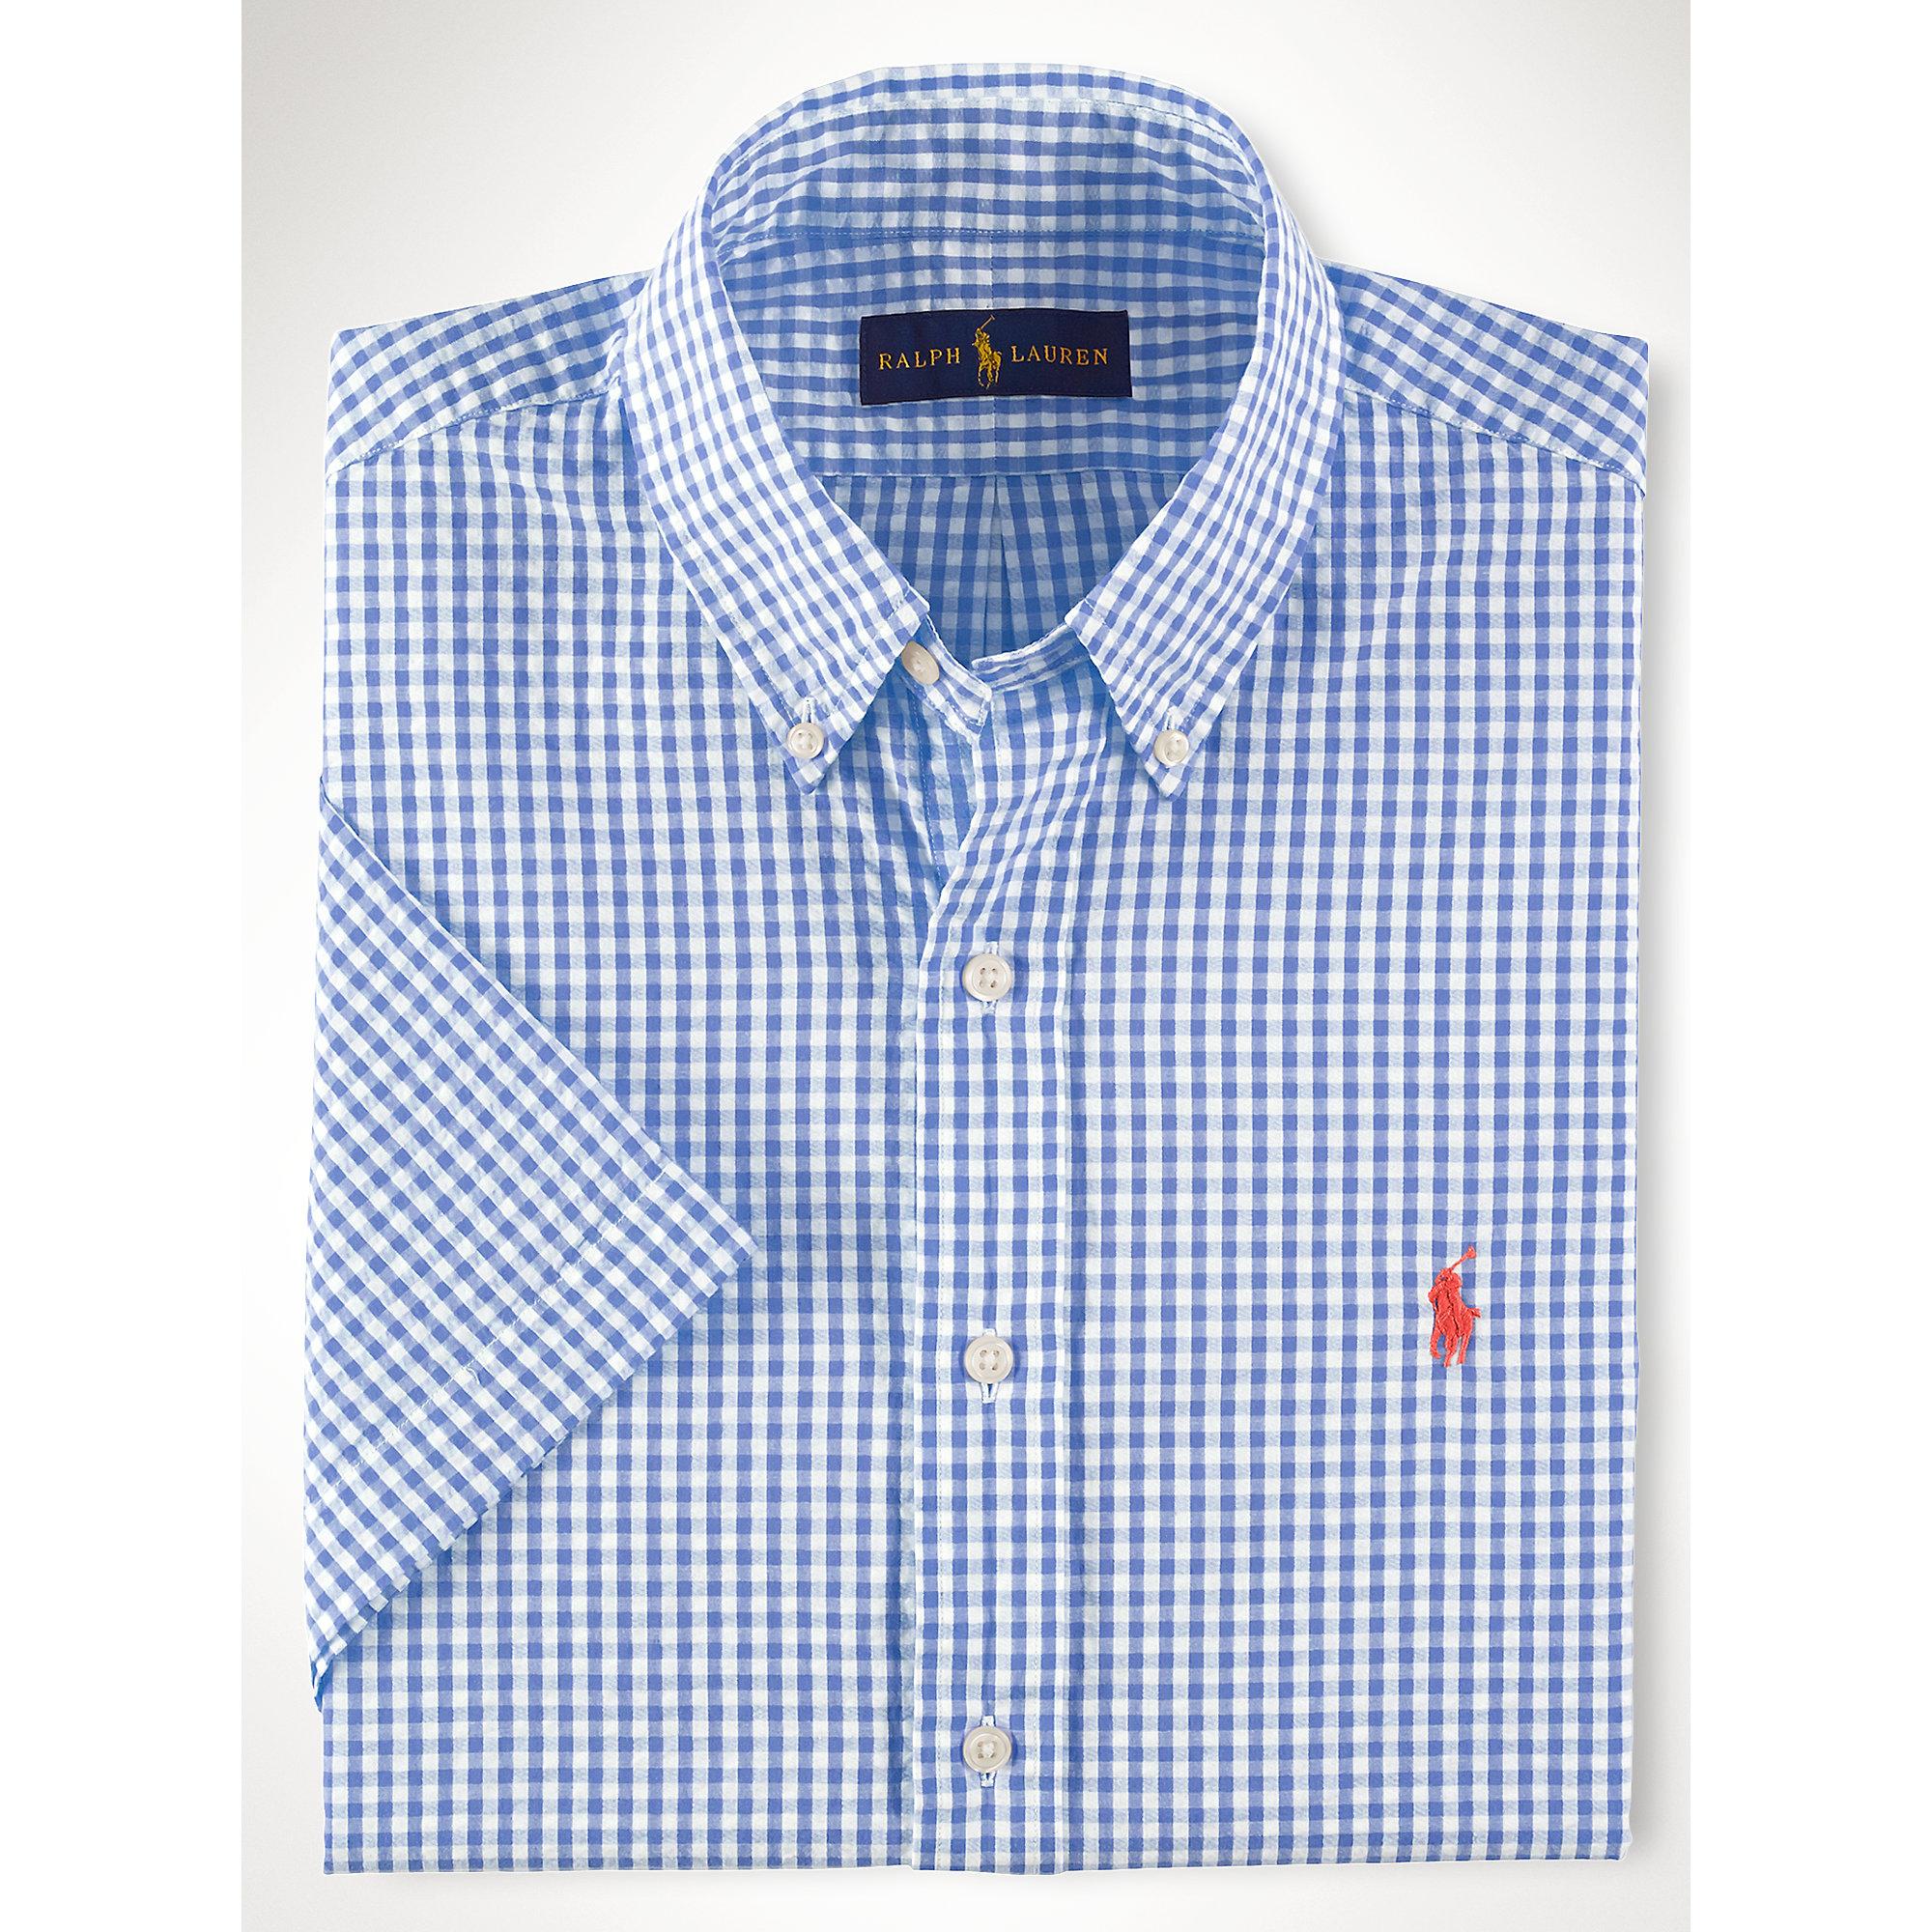 007d098ab ... uk lyst polo ralph lauren gingham seersucker shirt in blue for men  53c96 a9fbb